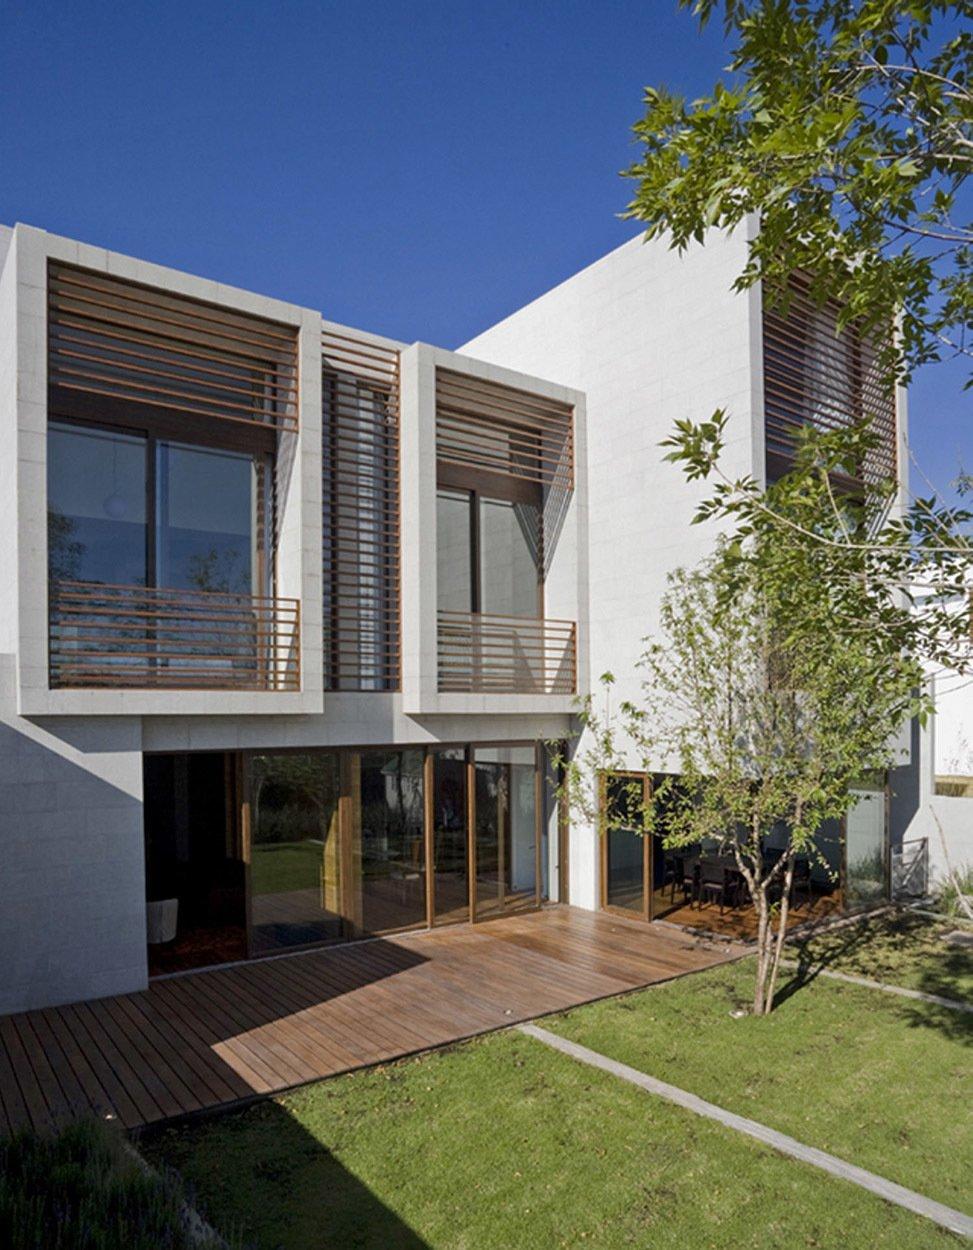 Casa LB by Serrano Monjaraz Arquitectos